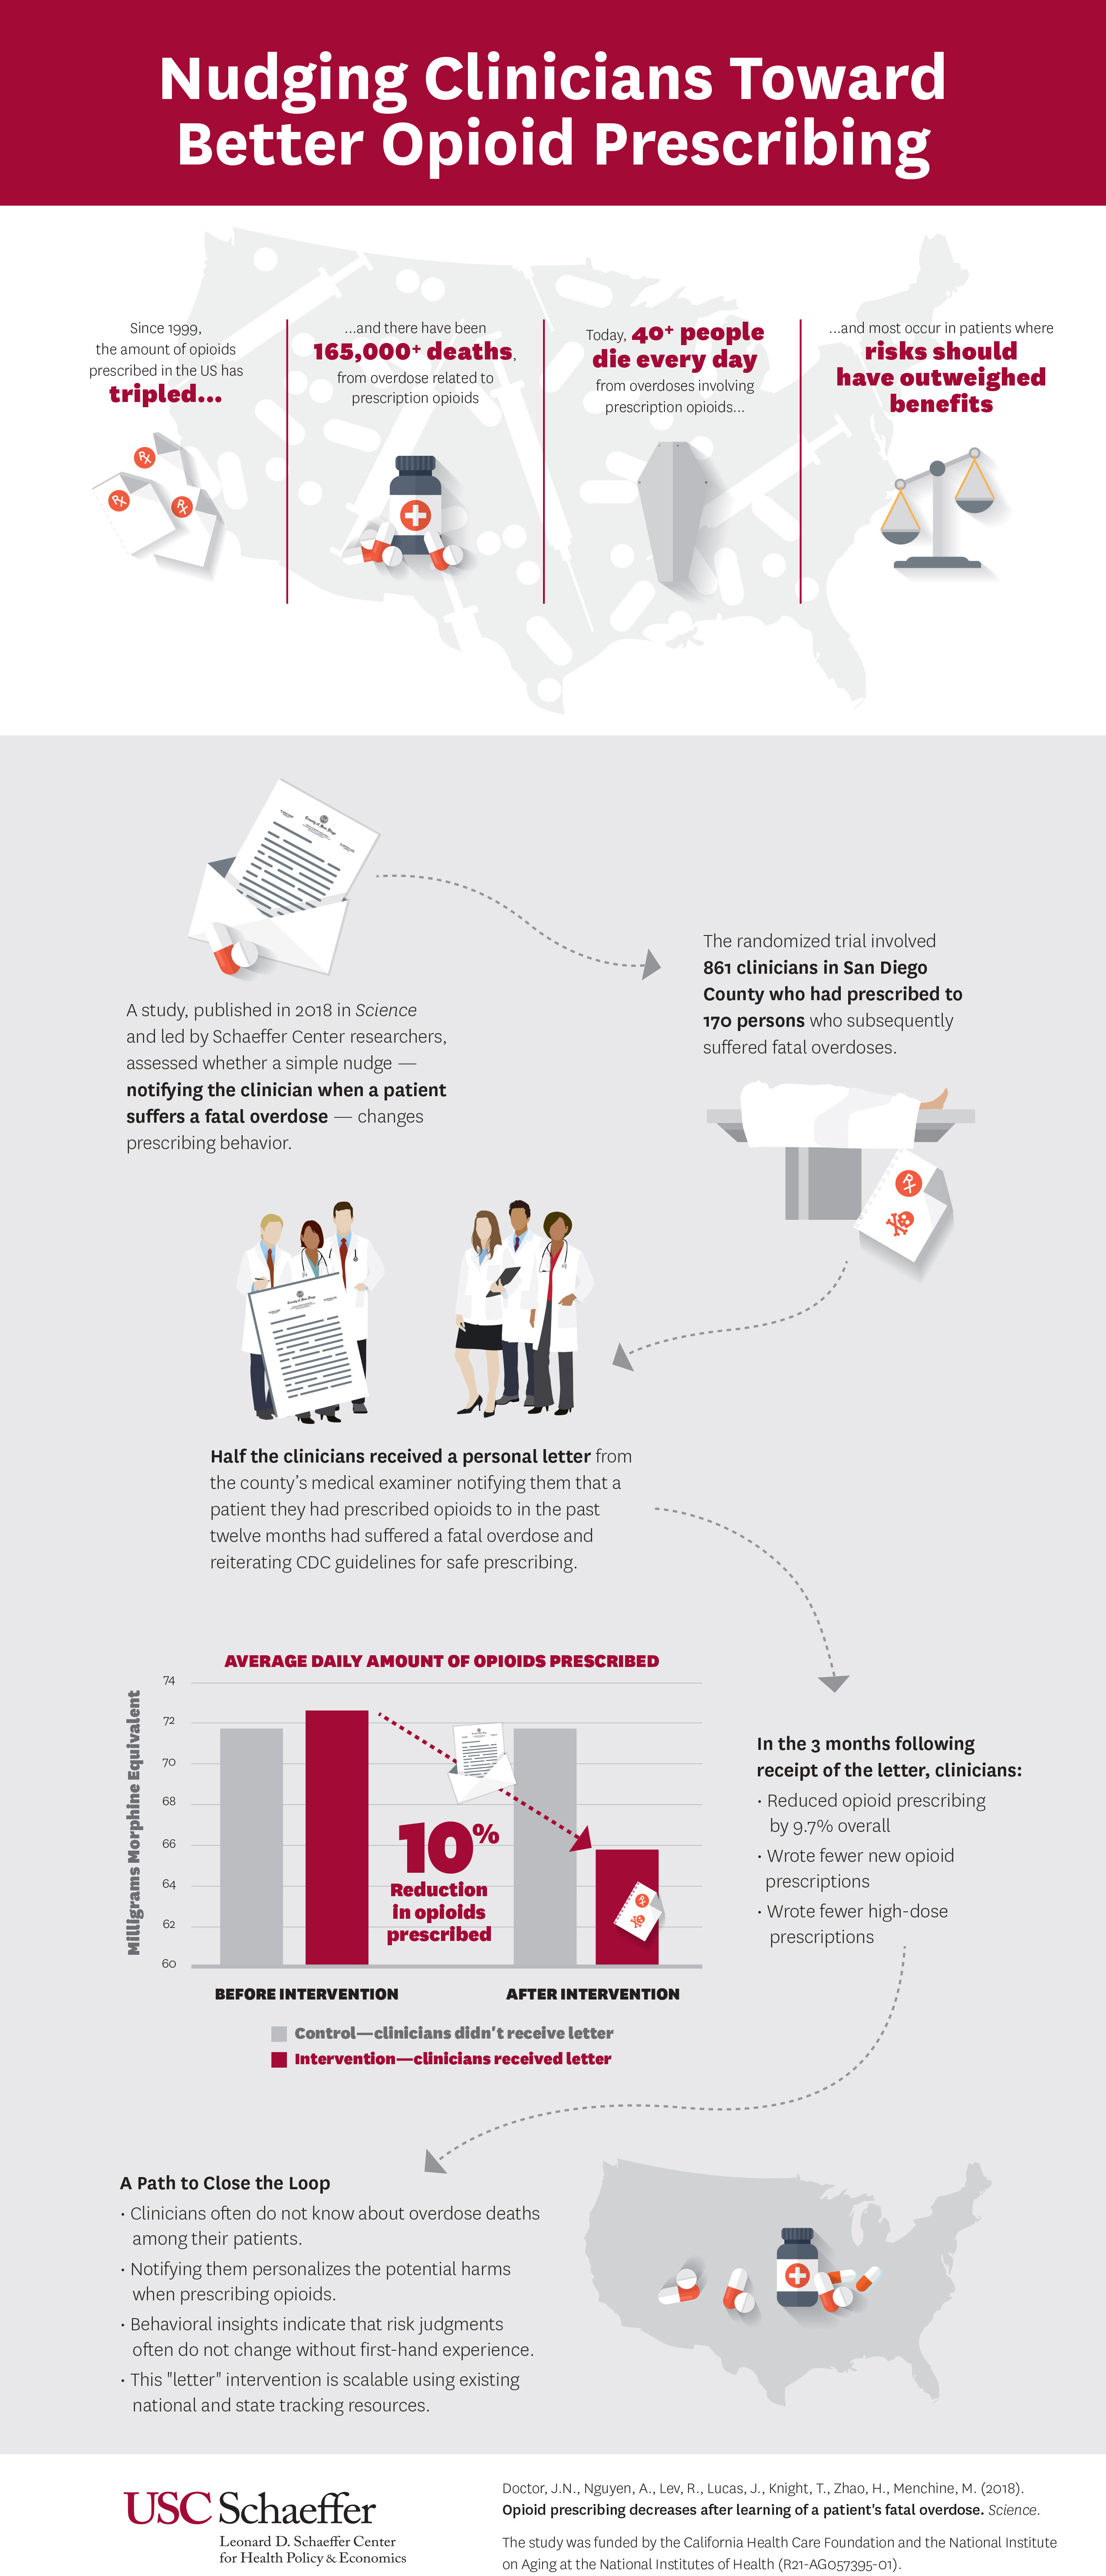 nudging clinicians toward better opioid prescribing graphic